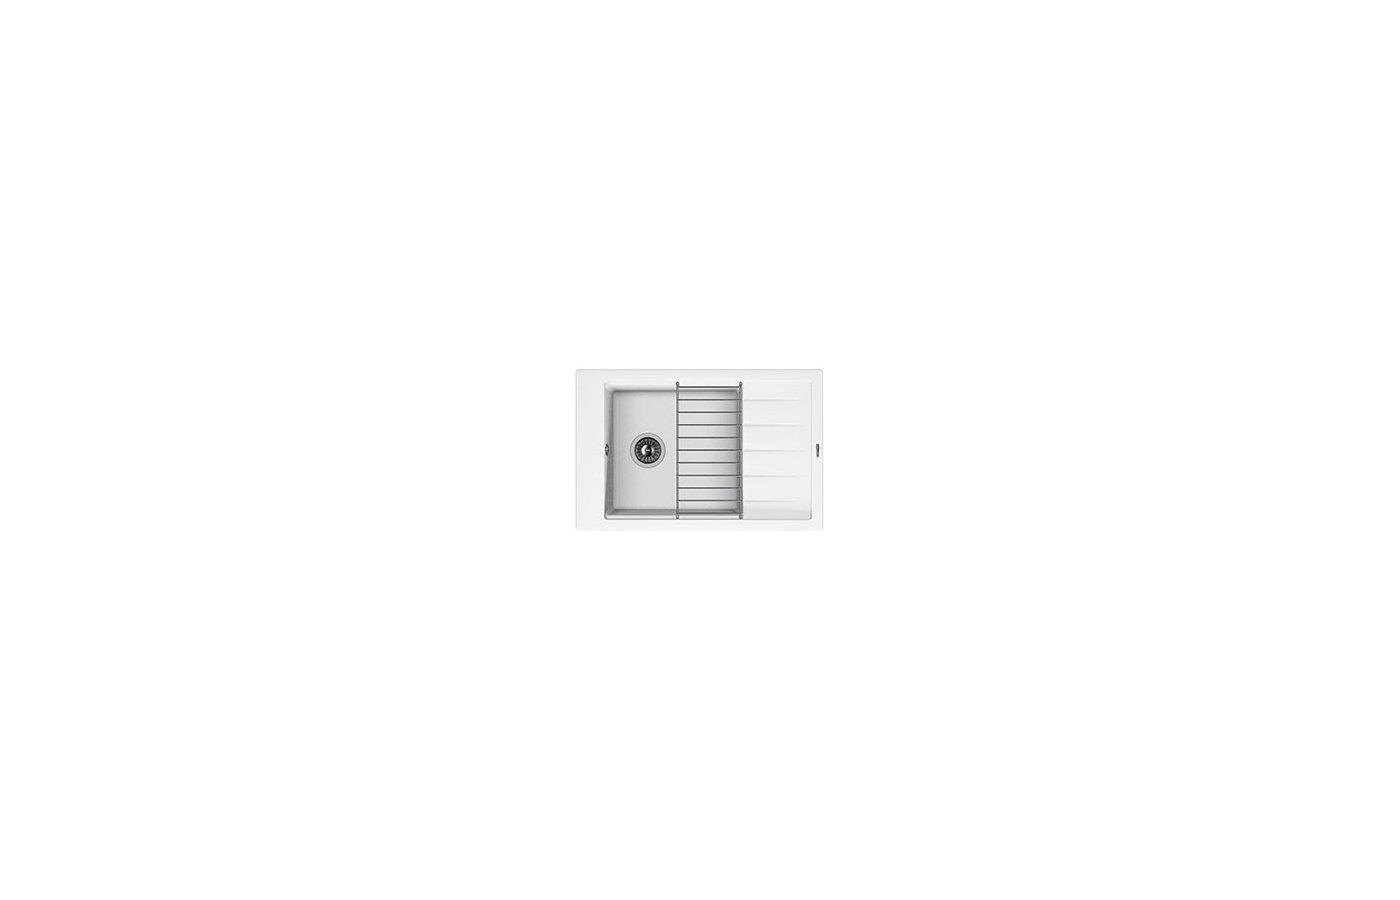 Кухонная мойка Florentina ЛИПСИ 780Р Жасмин FS